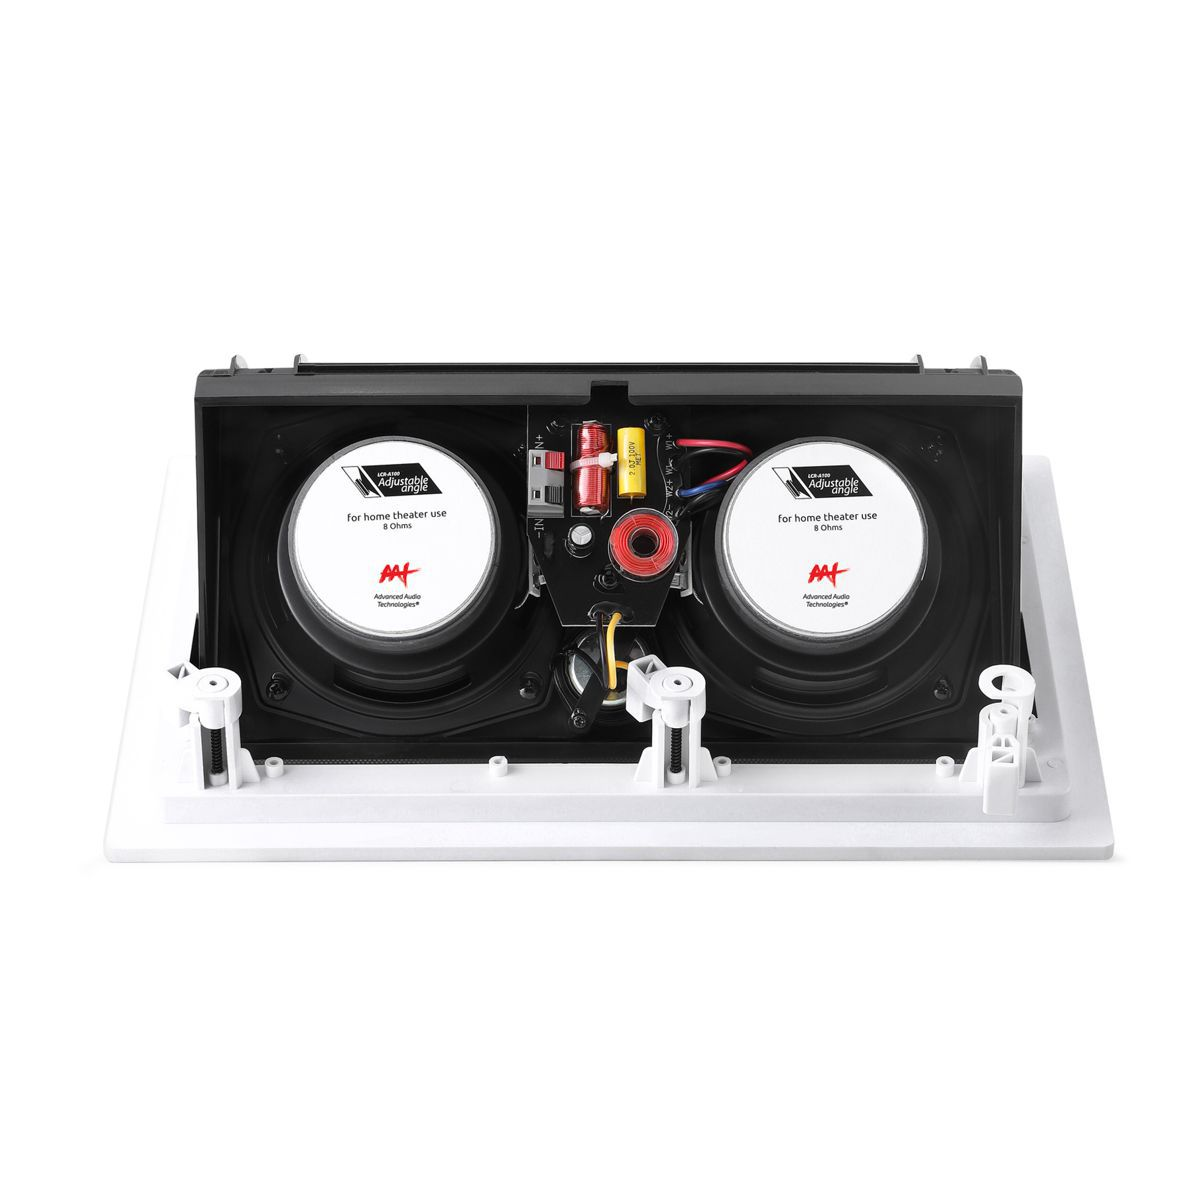 "Kit 5.1 Caixa de Embutir no Gesso LCR-A100 + LR-E100 + Subwoofer Cube Rakt 8"" AAT"